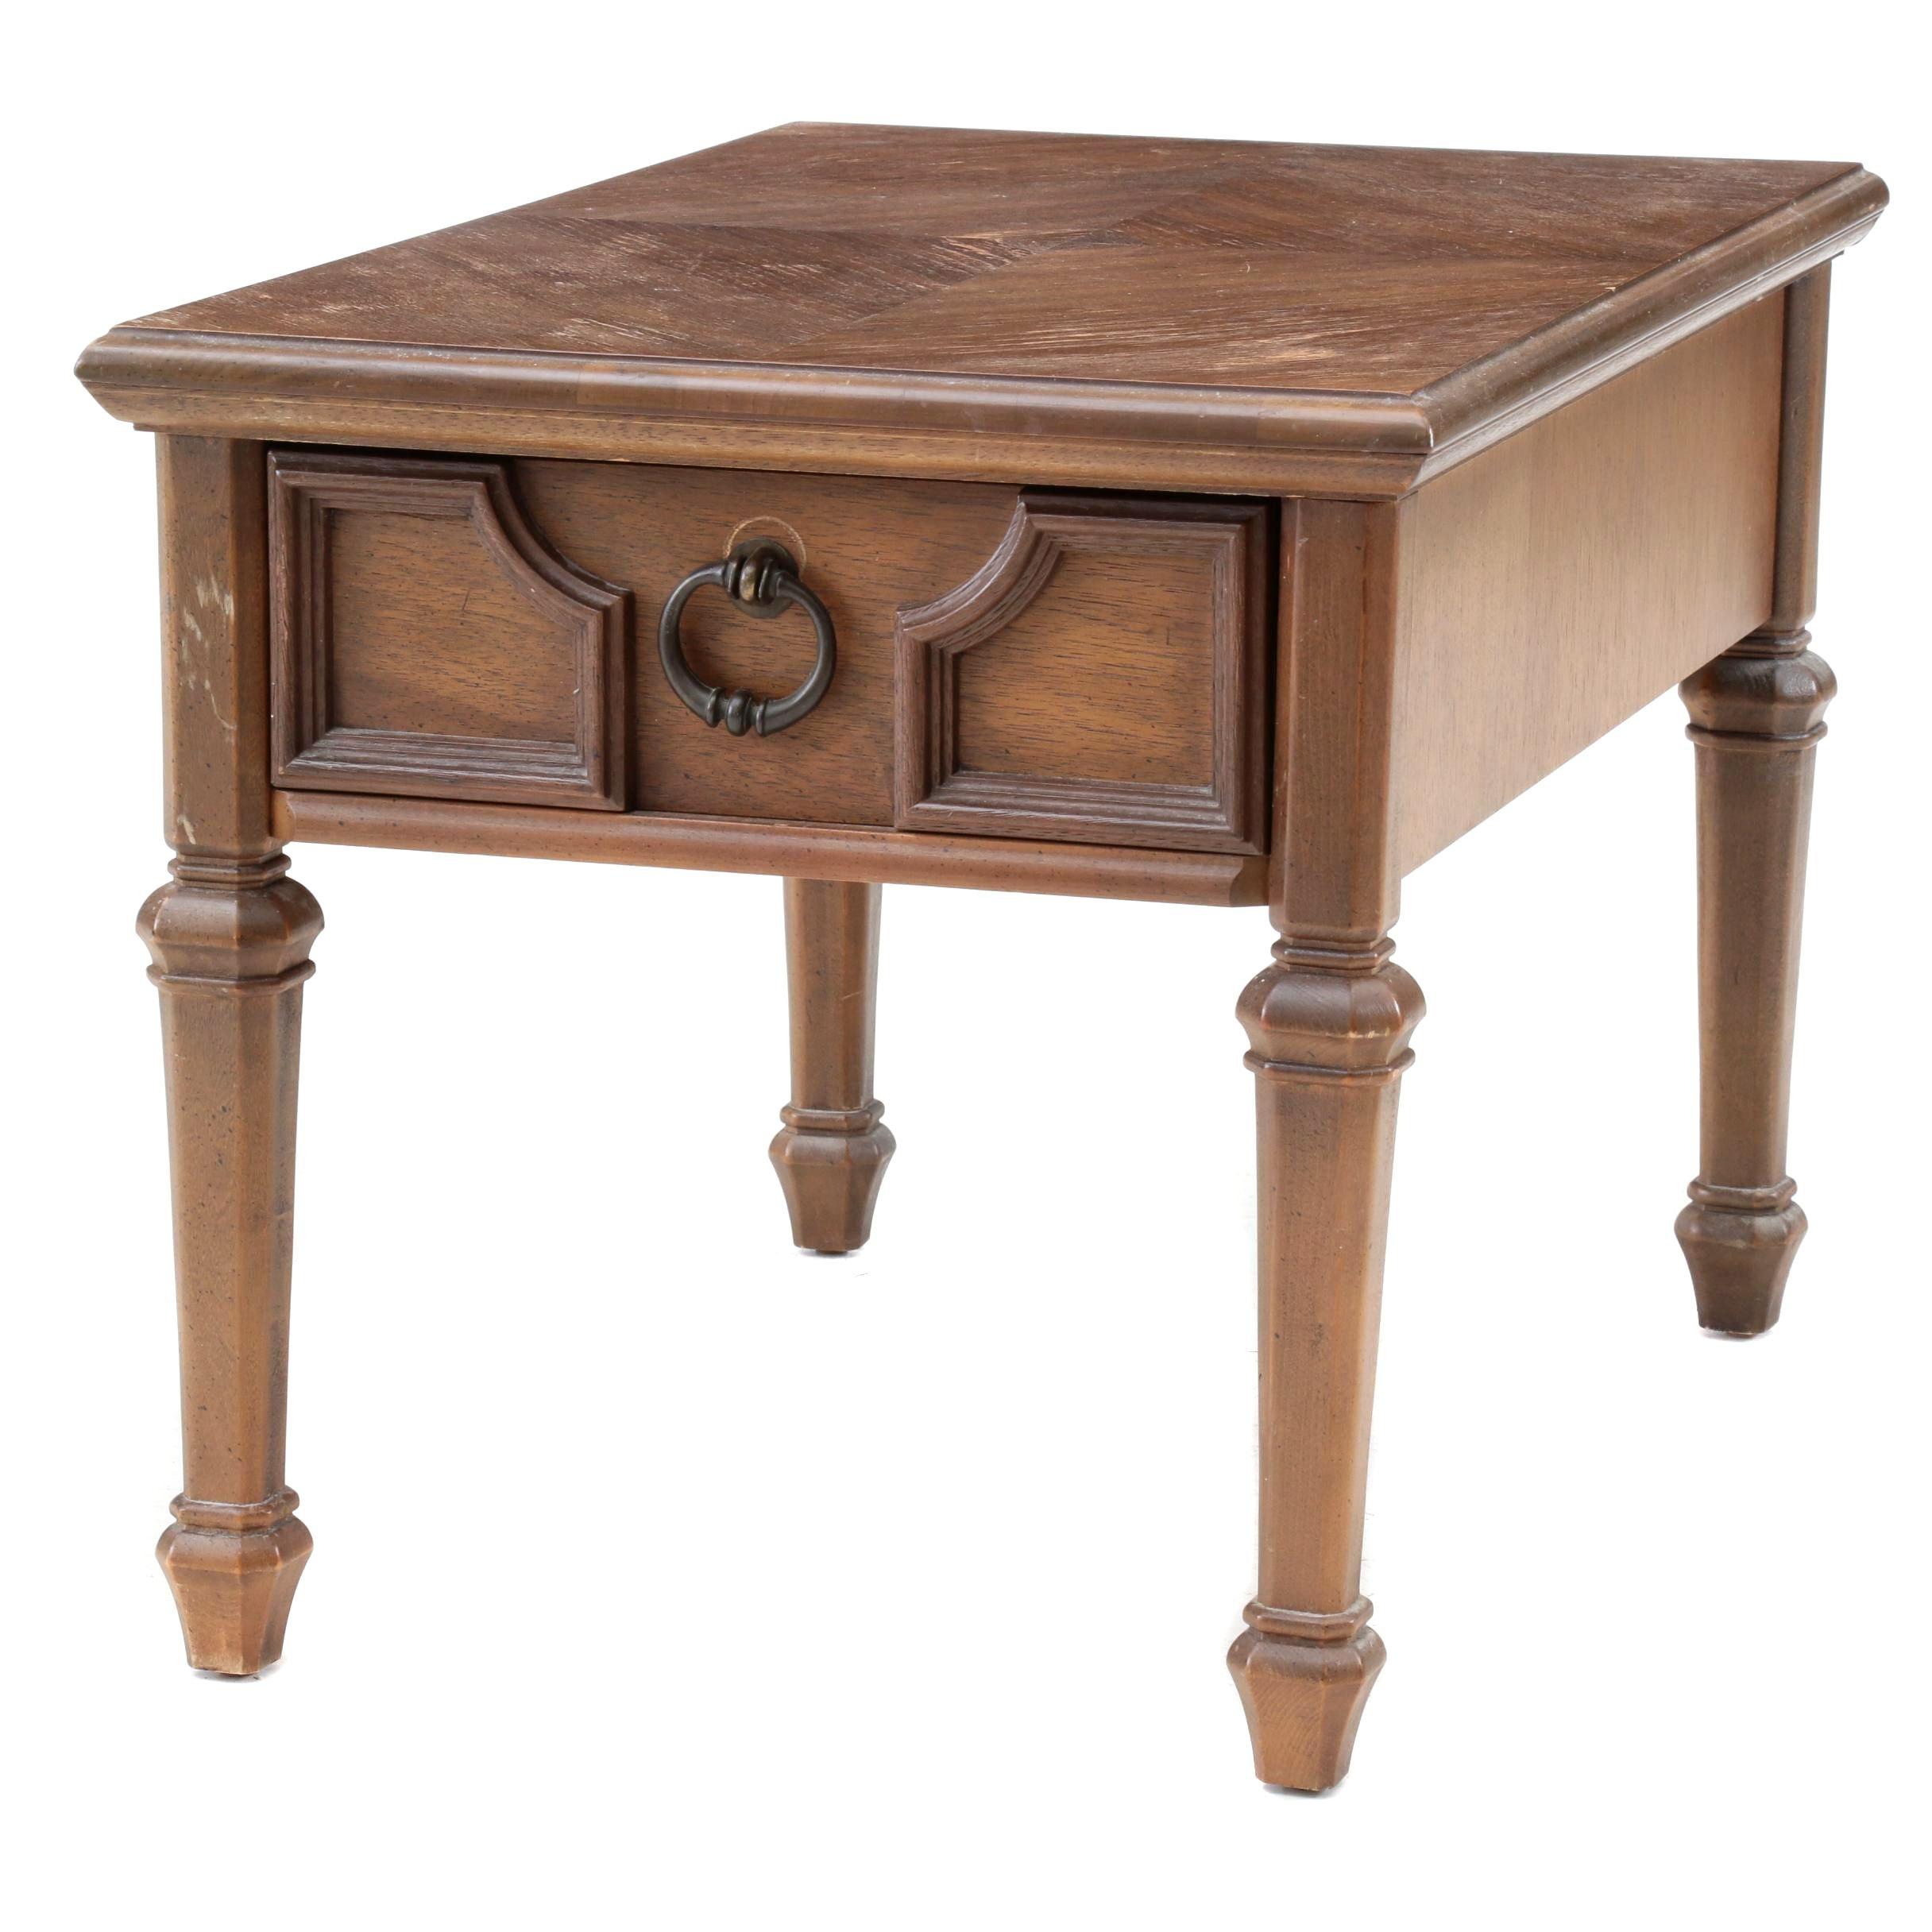 Stanley Furniture Mediterranean Style End Table